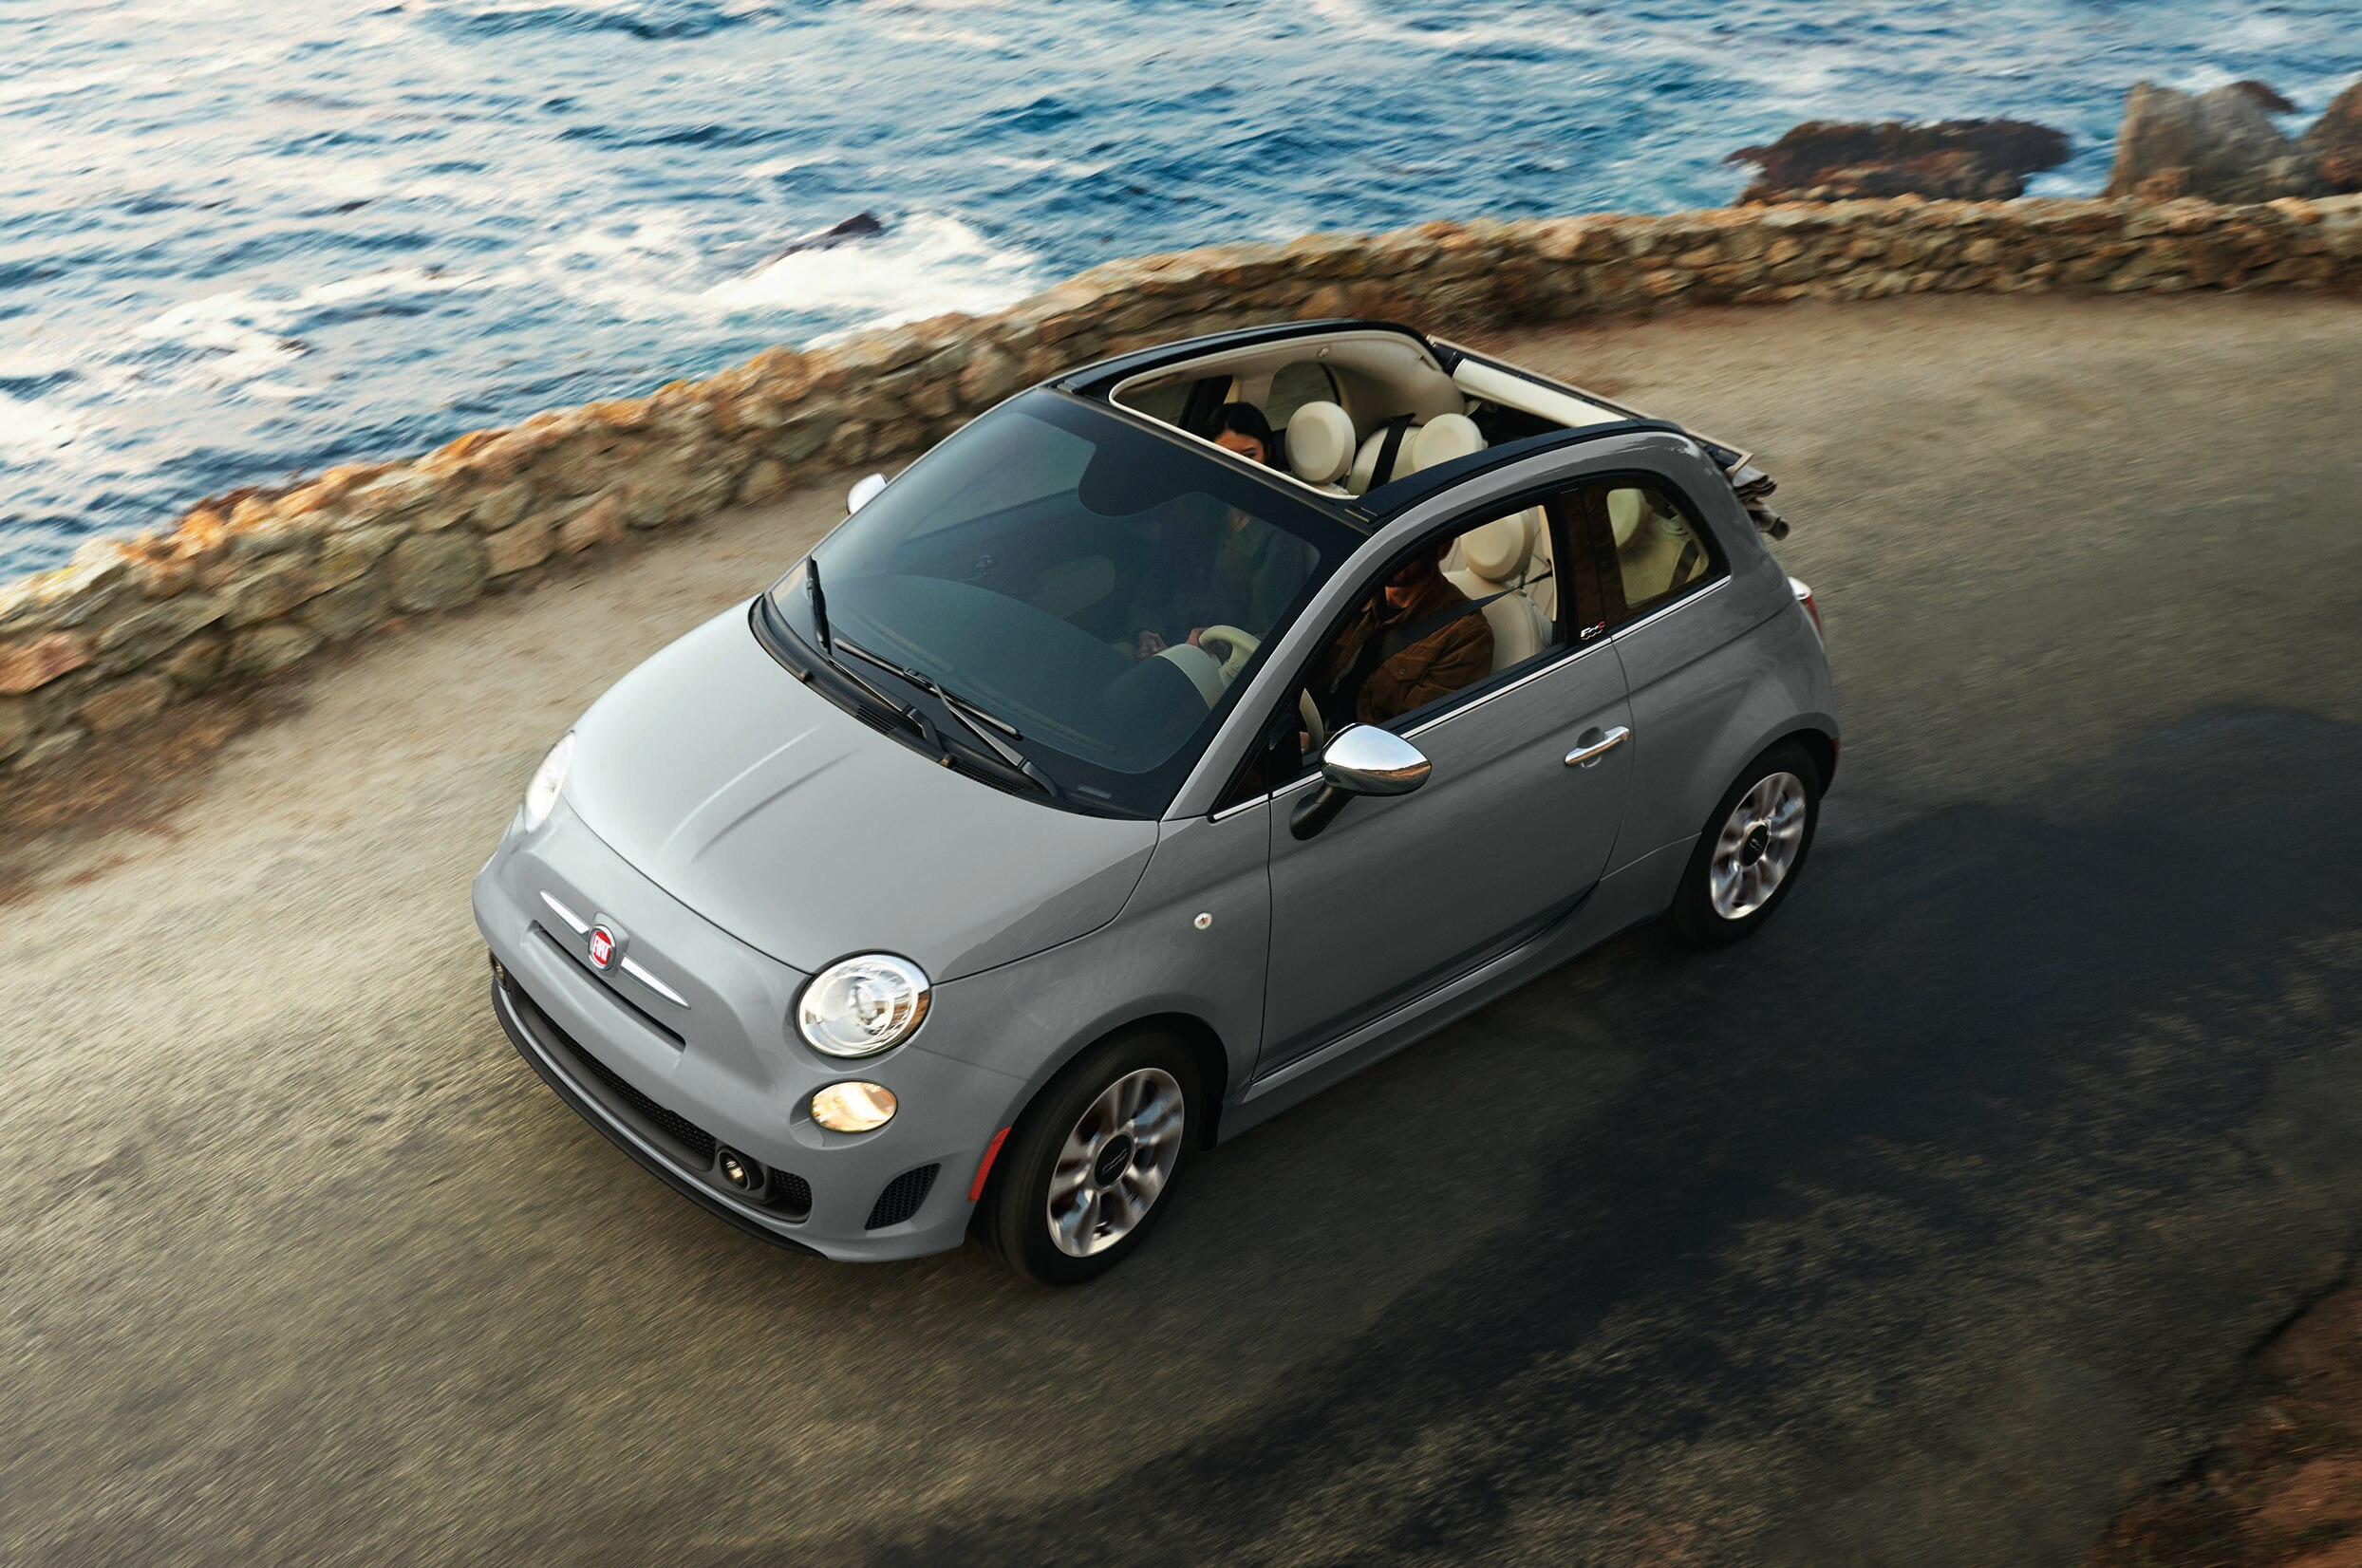 2018 Fiat 500c Front View